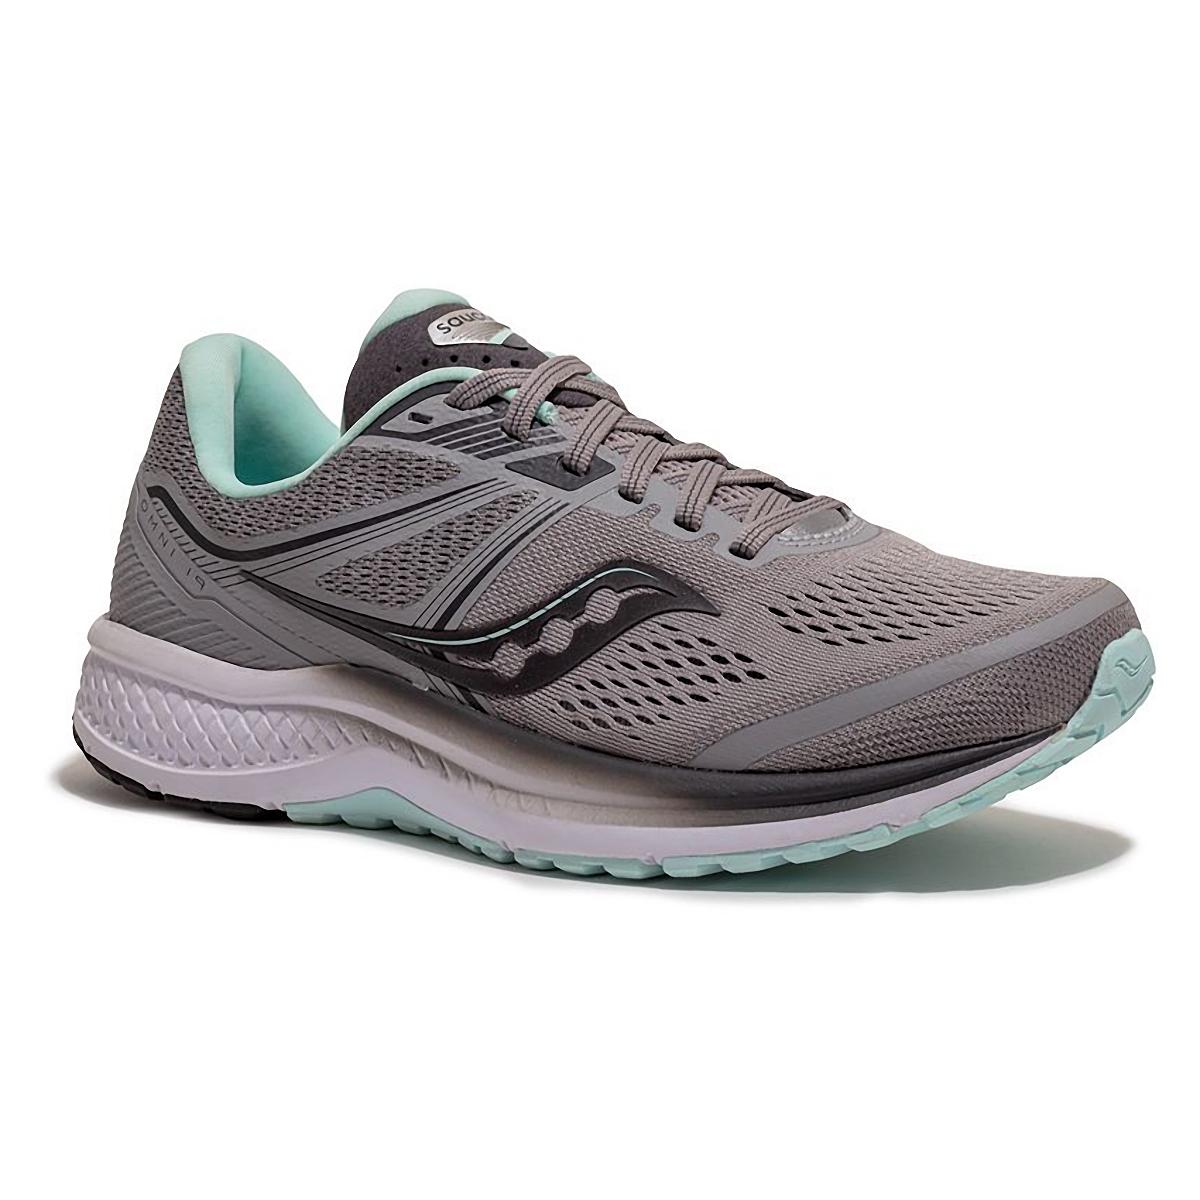 Women's Saucony Omni 19 Running Shoe - Color: Alloy/Sky - Size: 5 - Width: Regular, Alloy/Sky, large, image 5